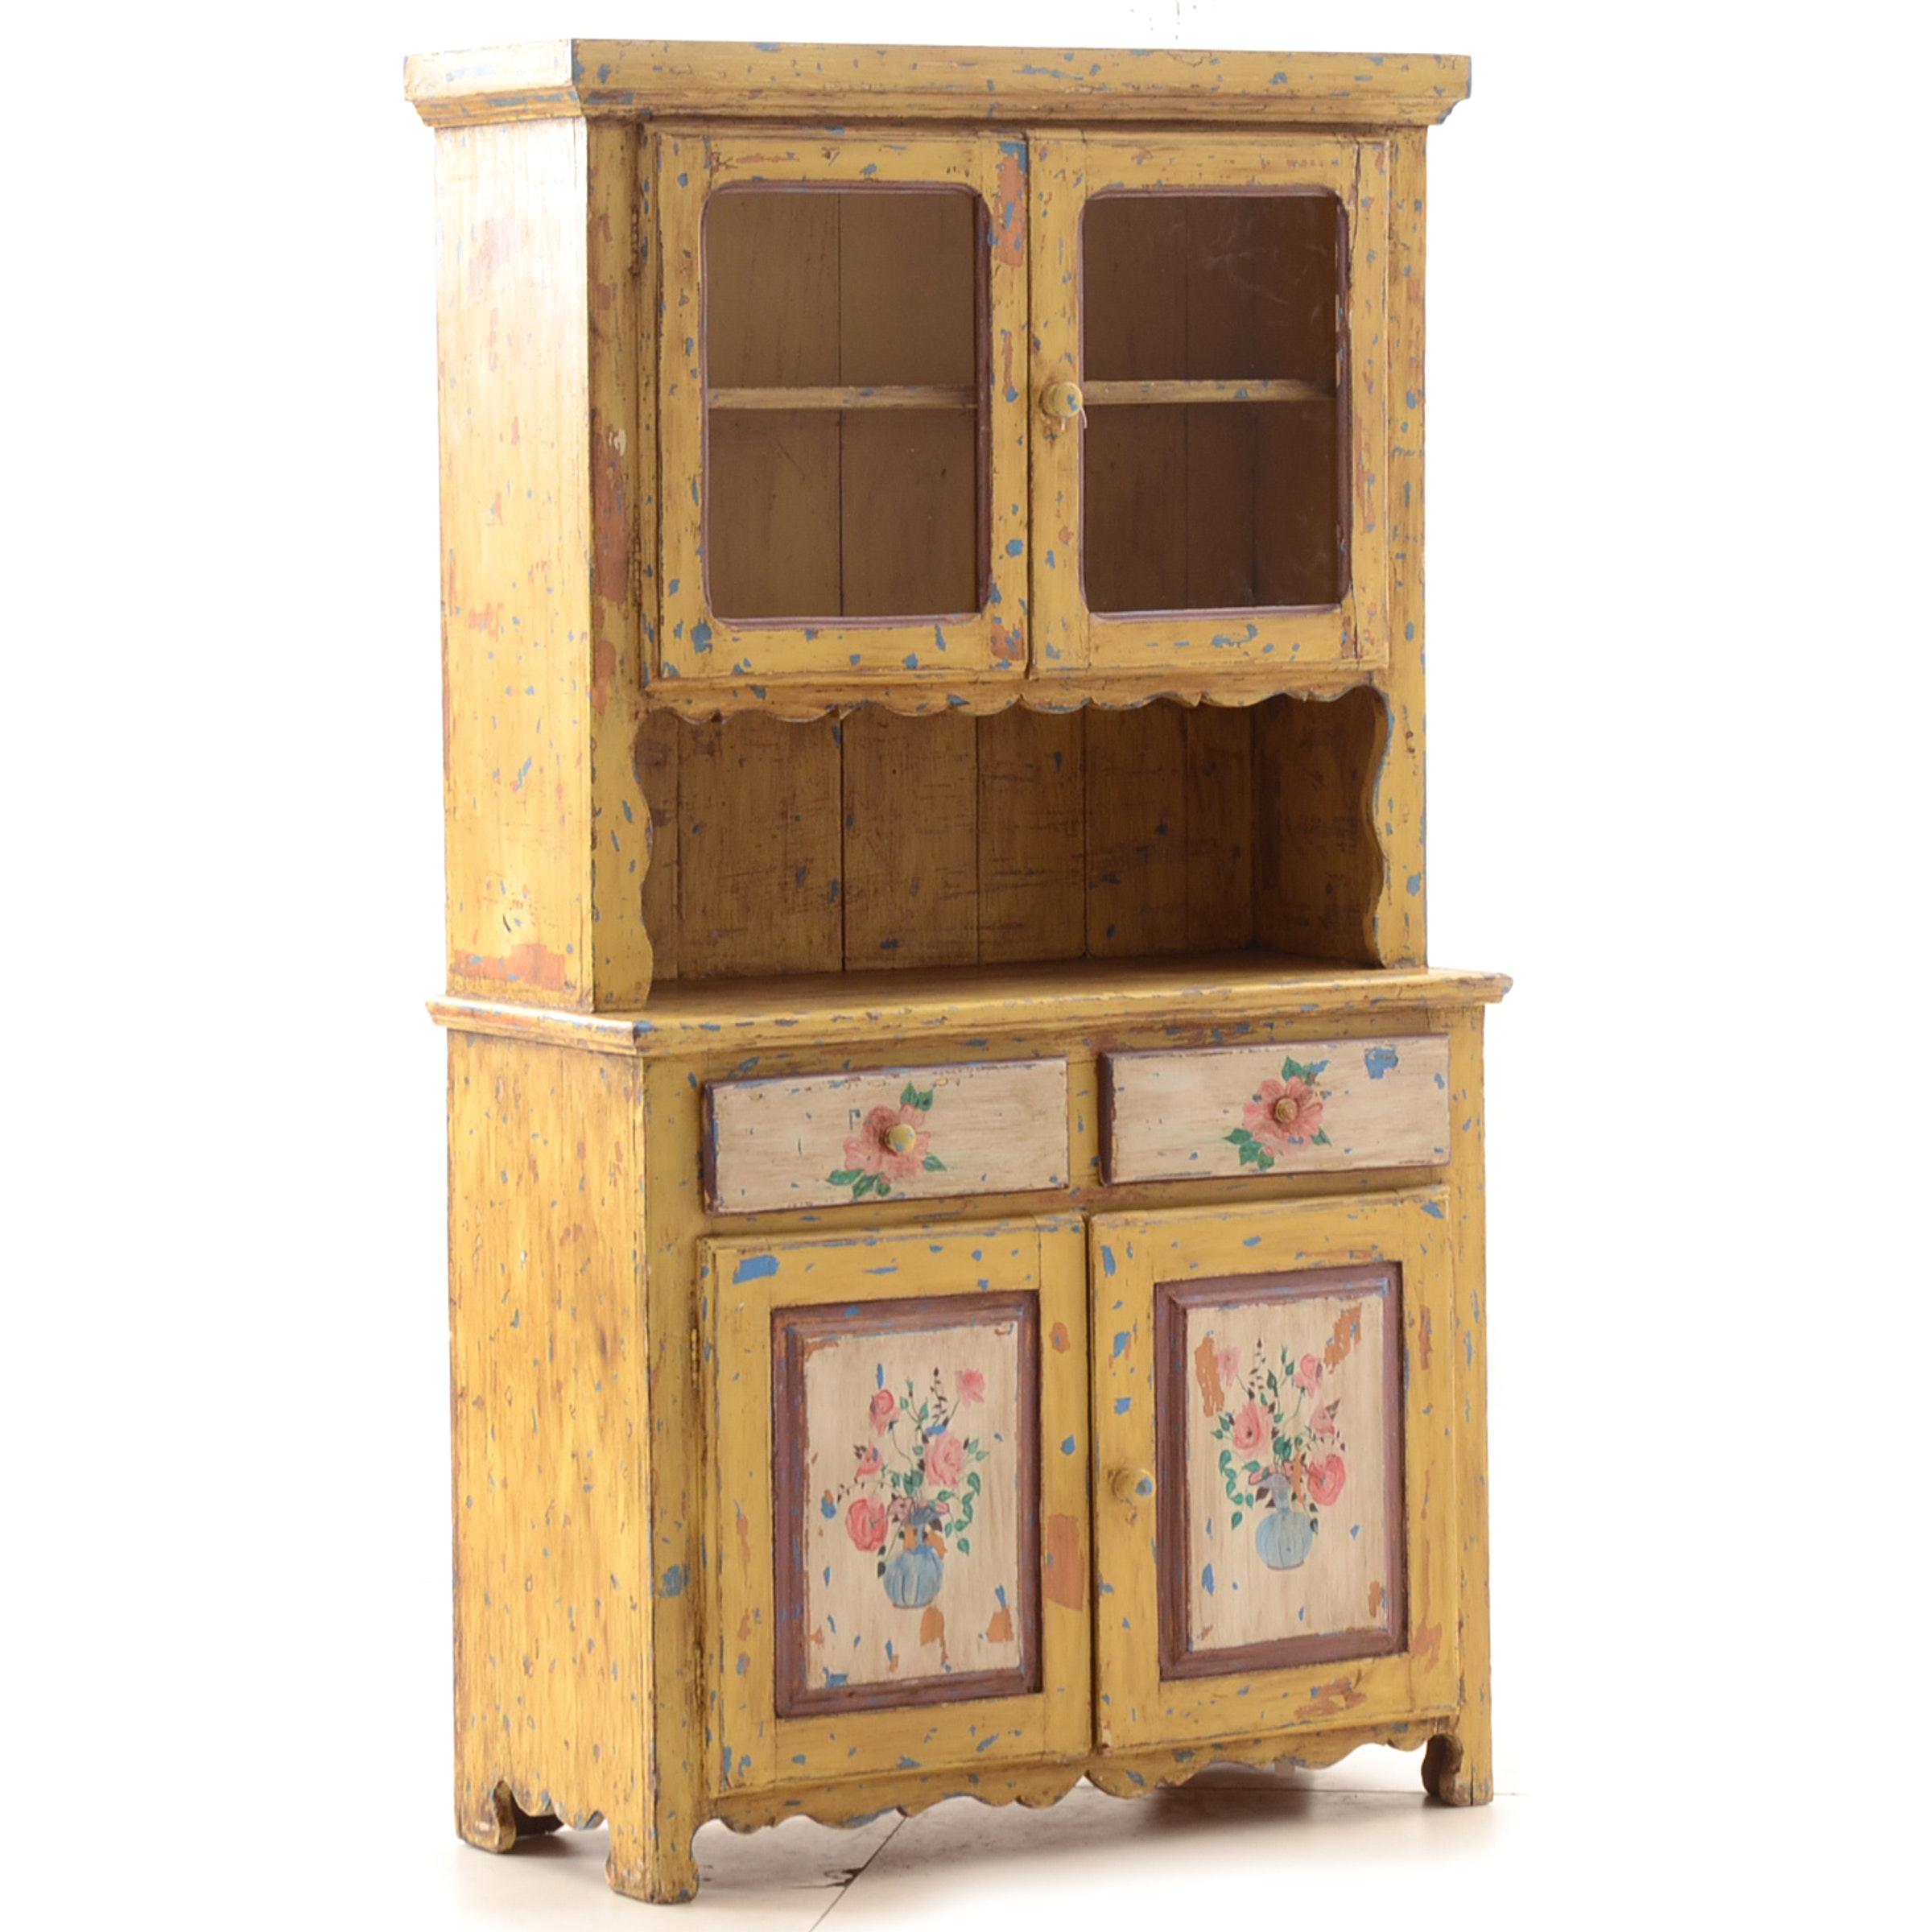 Vintage Rustic Kitchen Cabinet